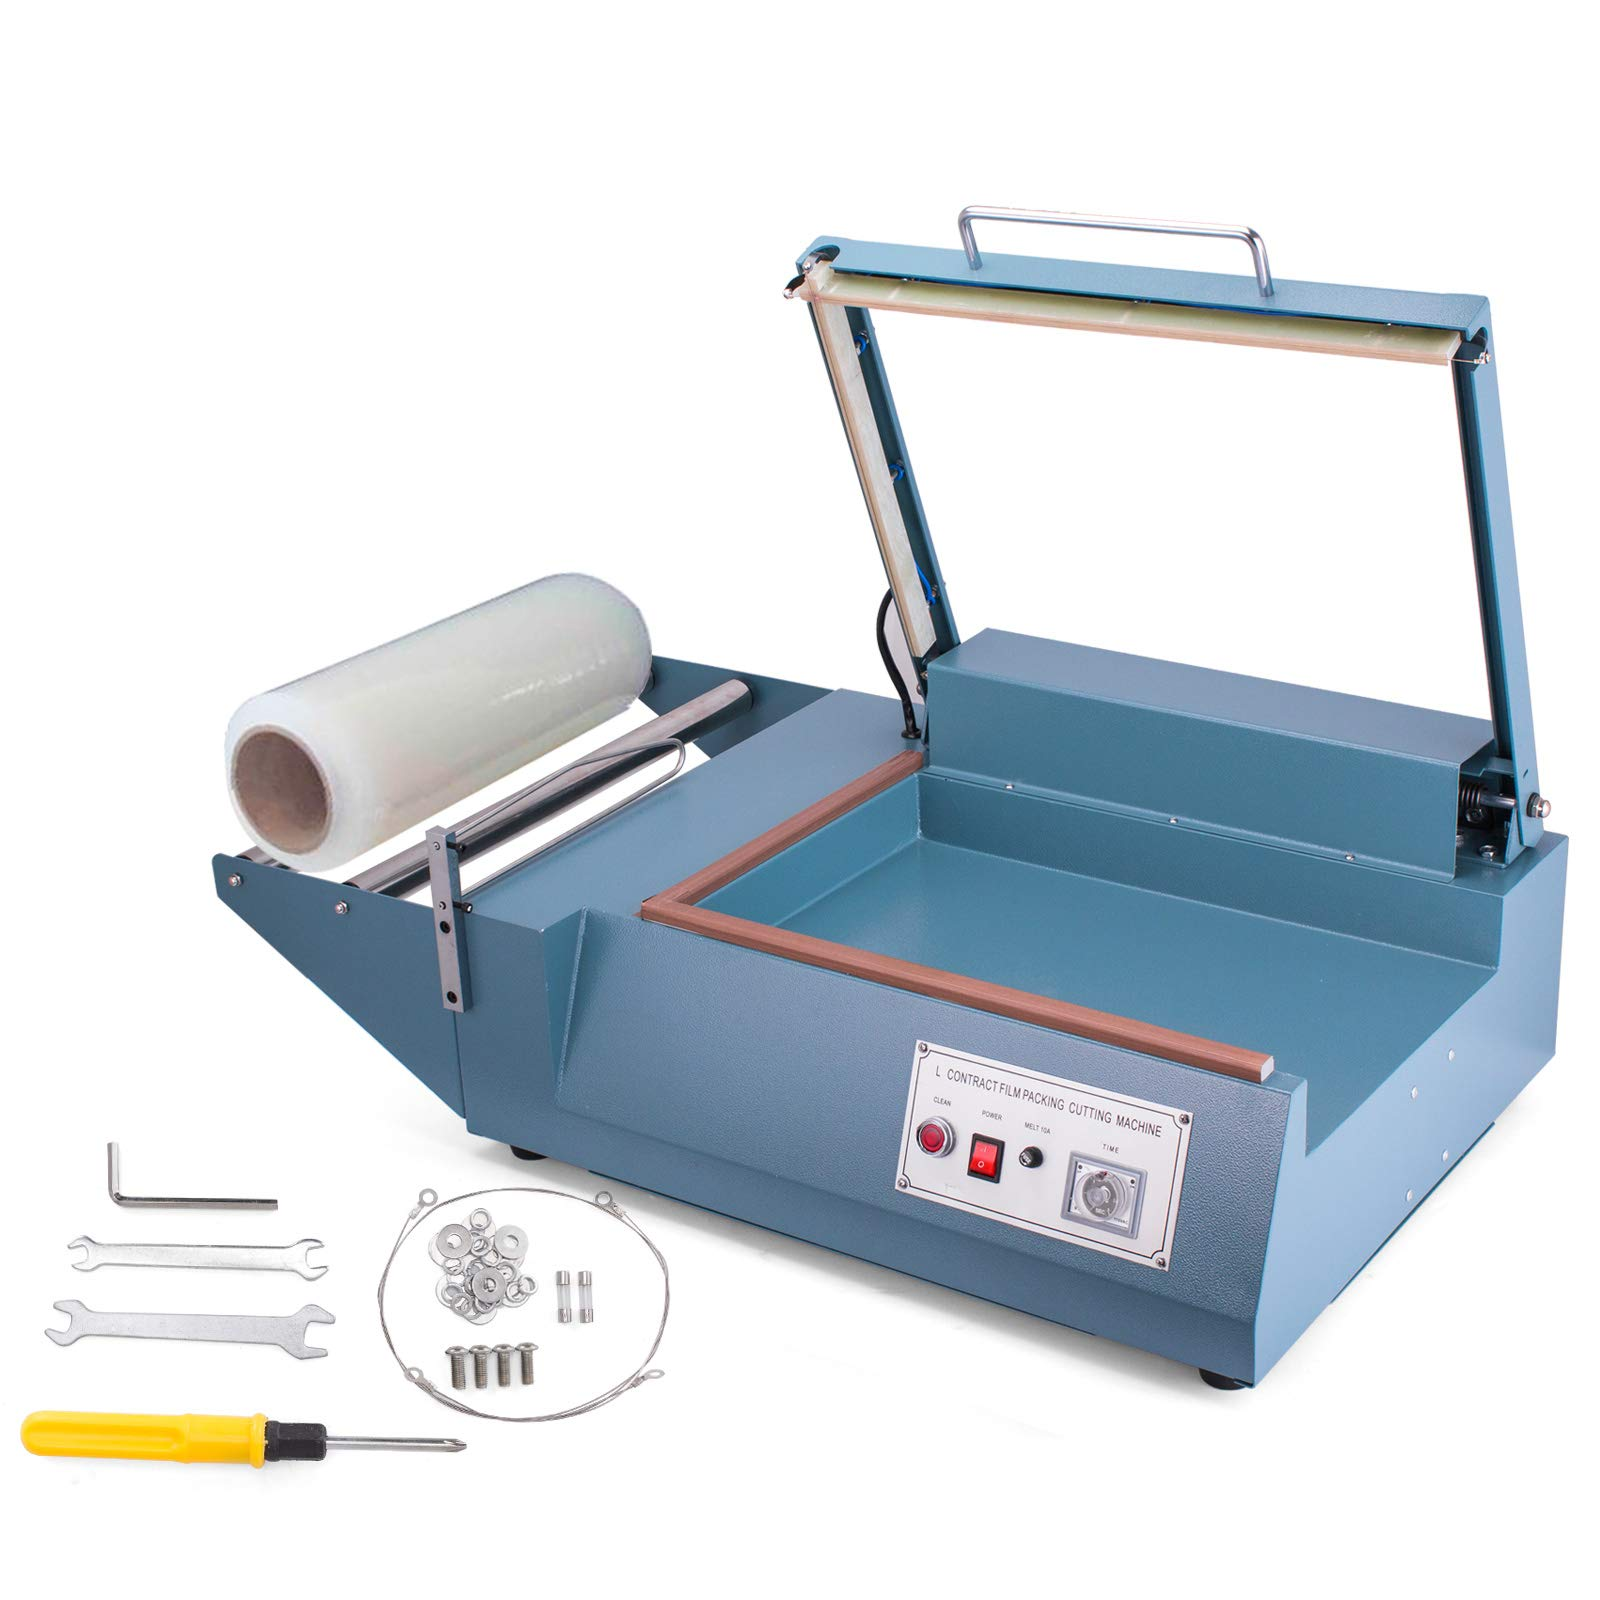 Mophorn FQL-380L L-Bar Sealer 800W L-Bar Shrink Wrap Sealer Cutting Size 20 x 13.8 Inch L-Bar Sealer Machine for Home Commercial Use by Mophorn (Image #1)